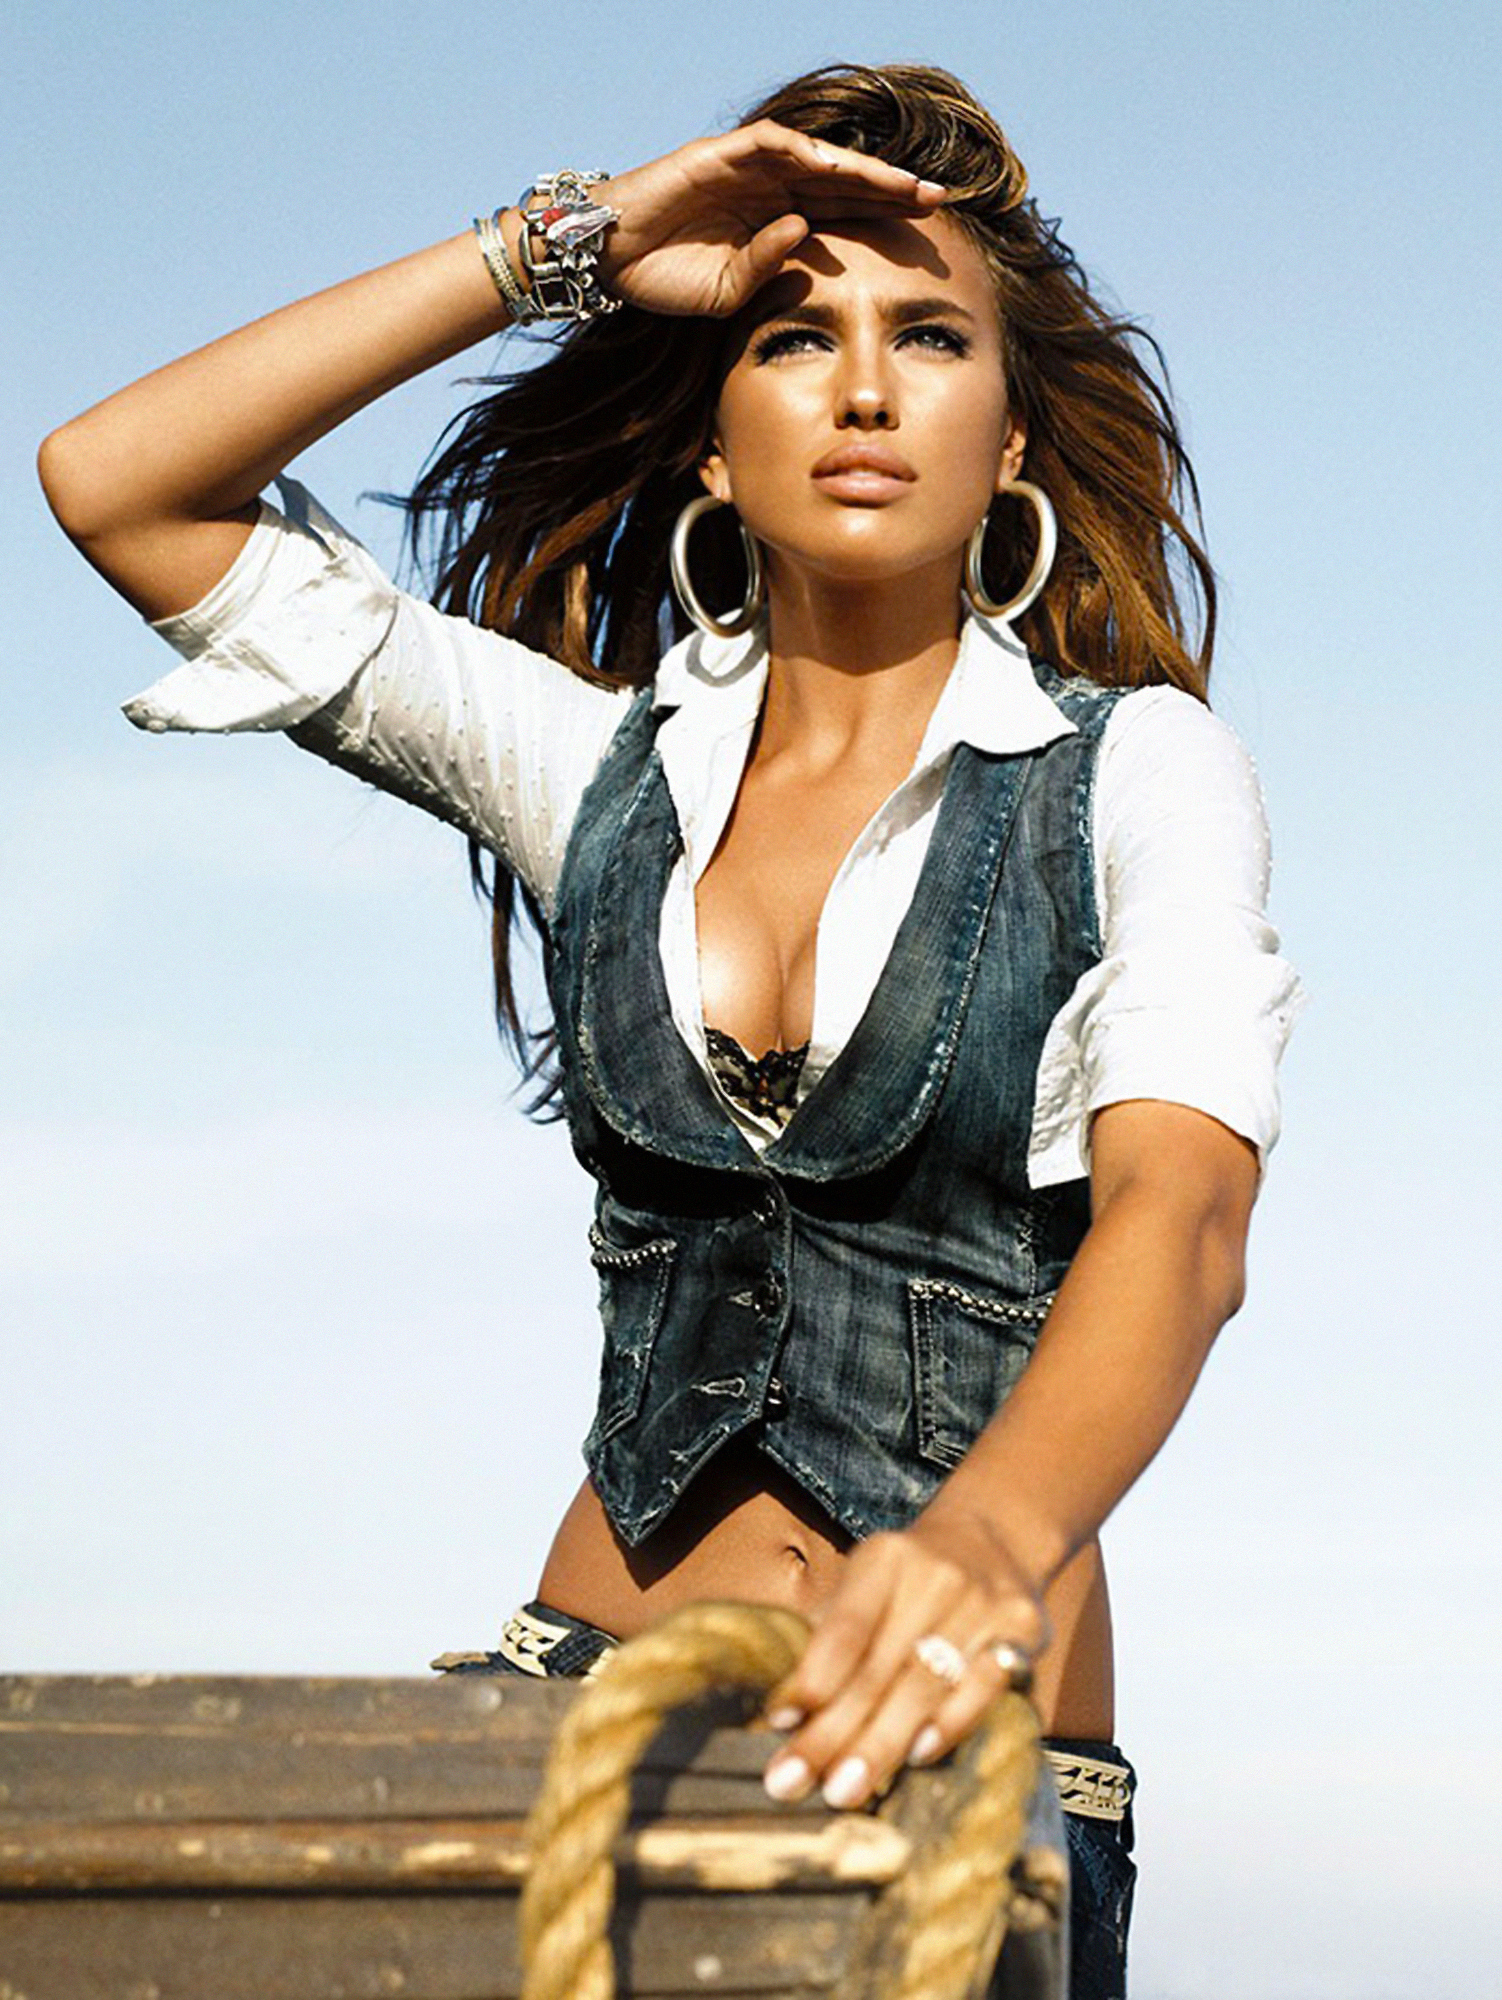 Irina Shayk Guess Jeans Irina Shayk Hot For Guess